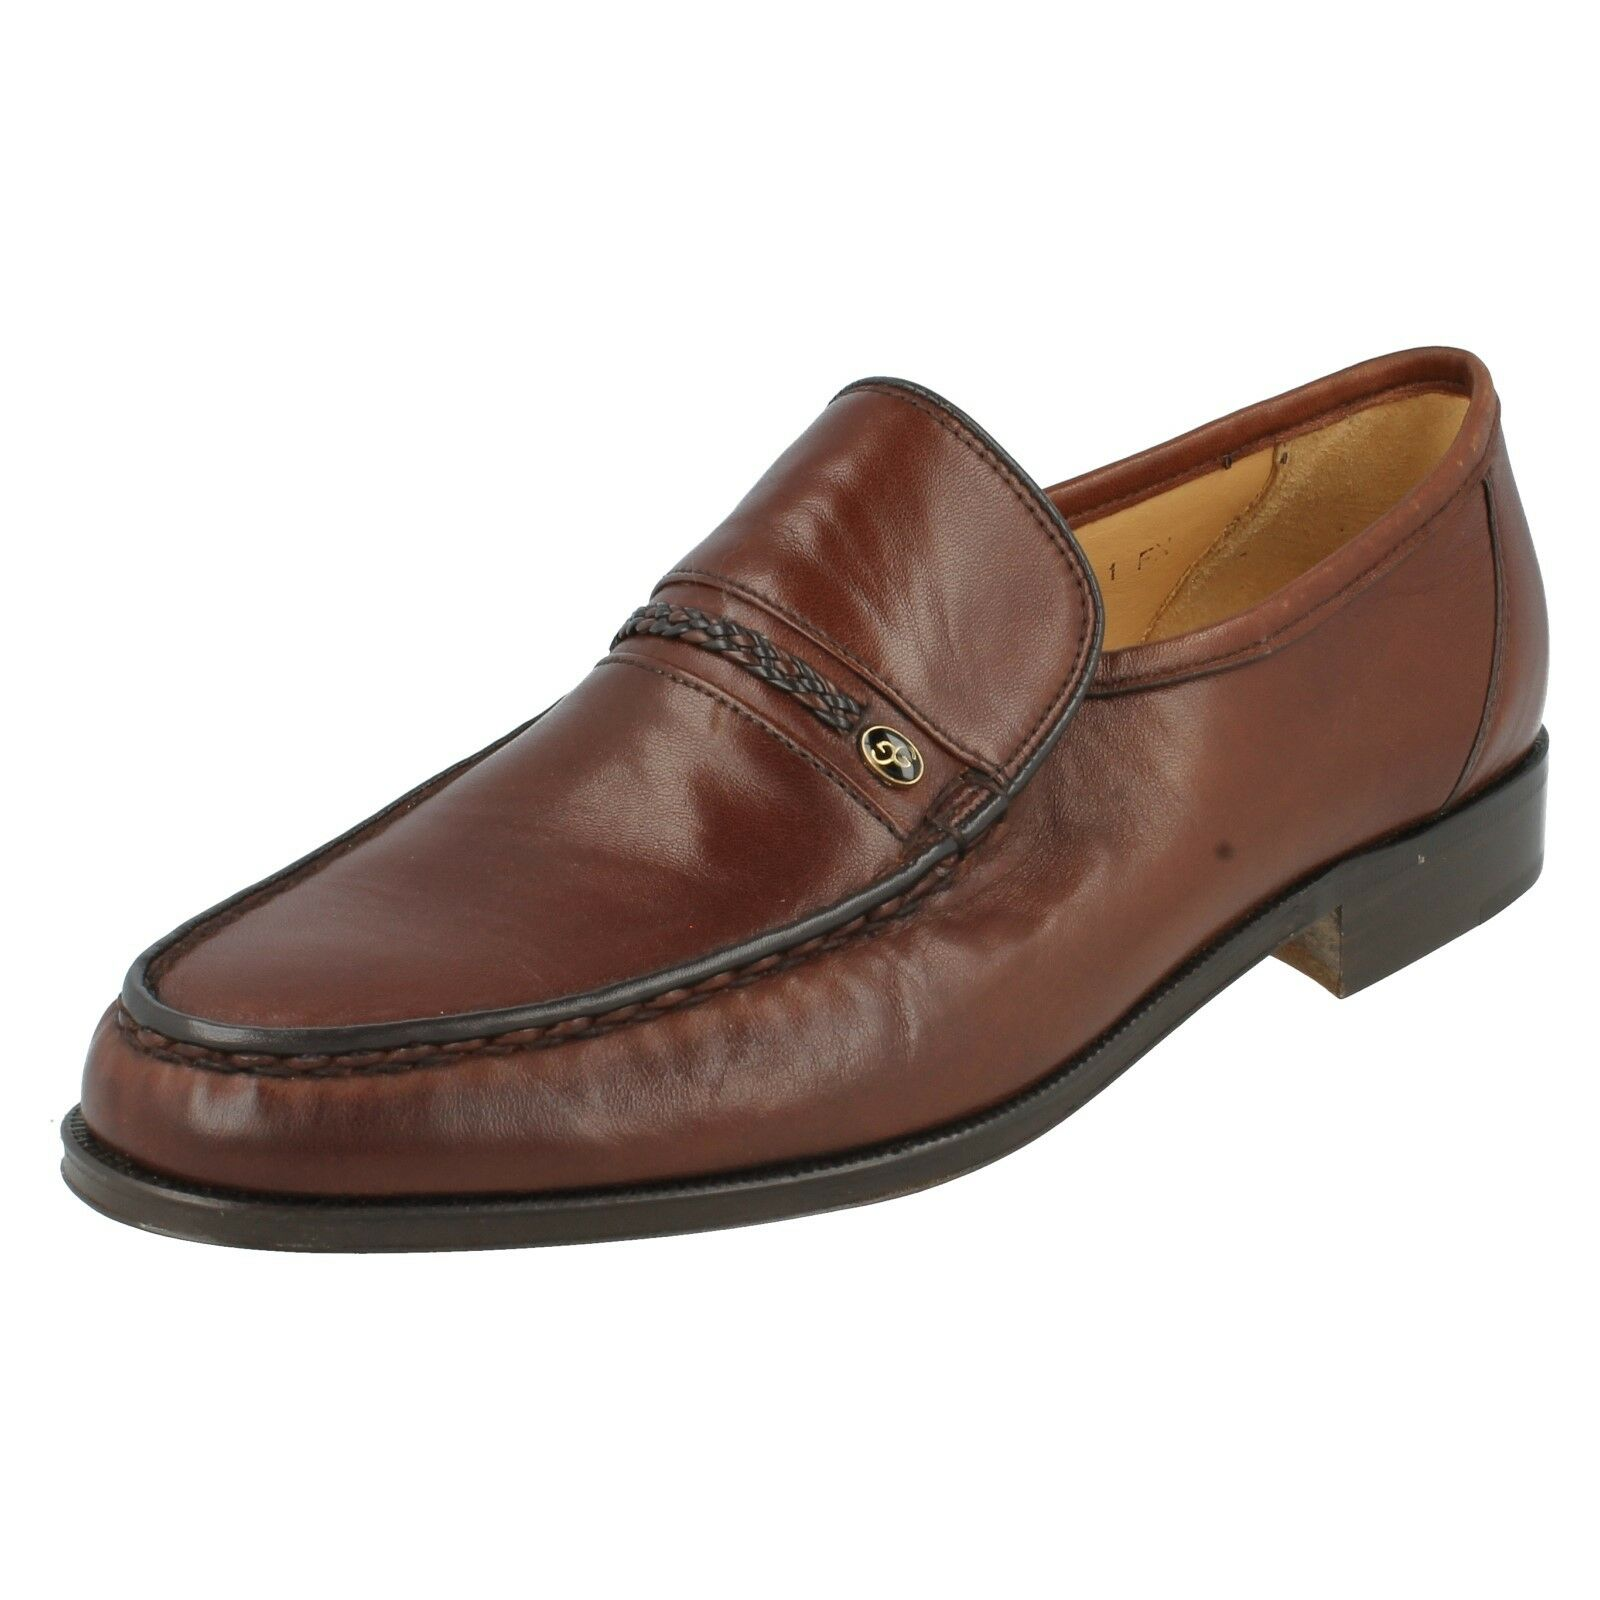 AMOS AMOS AMOS  Herren GRENSON BROWN GREEN PLAIN LEATHER SLIP ON MOCCASIN SMART FORMAL Schuhe 99635d